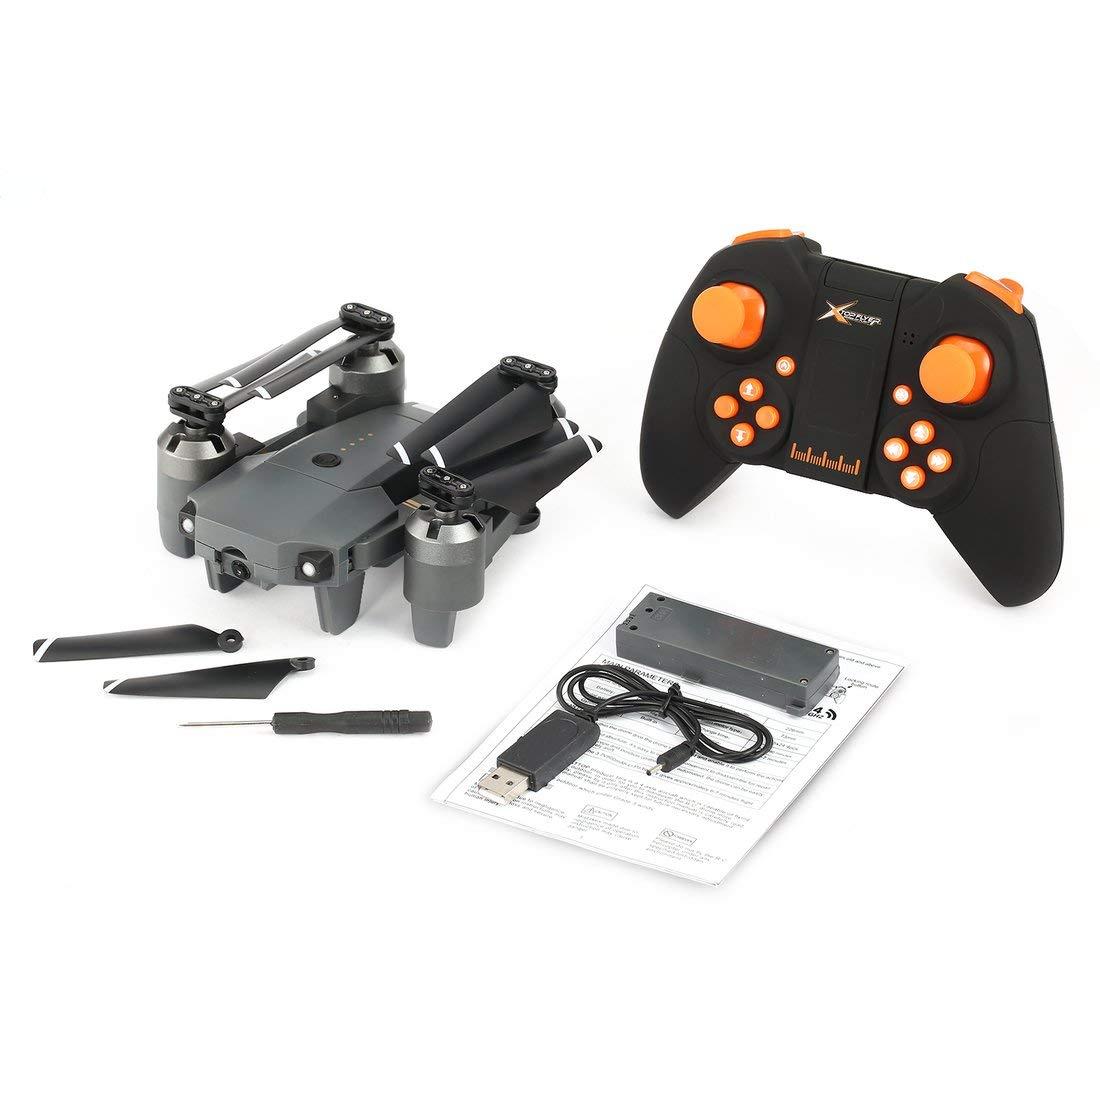 Attop XT-1 WiFi 2.4G FPV Cámara Drone 3D Flip Altitude Hold Plegable One-Key despegue / Aterrizaje sin Cabeza Modo RC Quadcopter